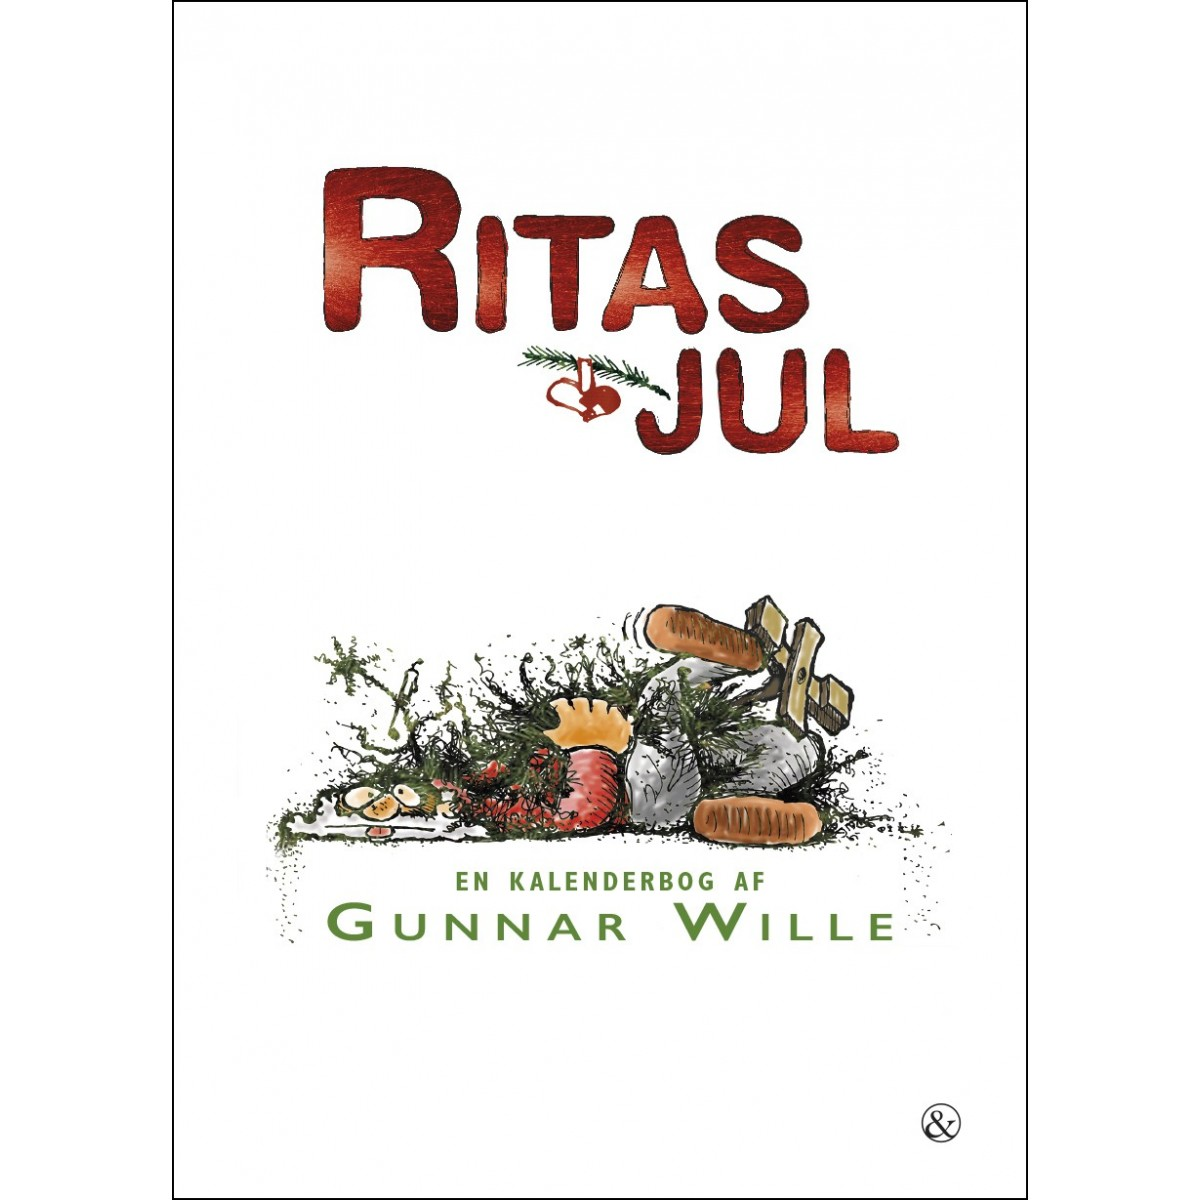 Gunnar Wille: Ritas jul - En kalenderbog